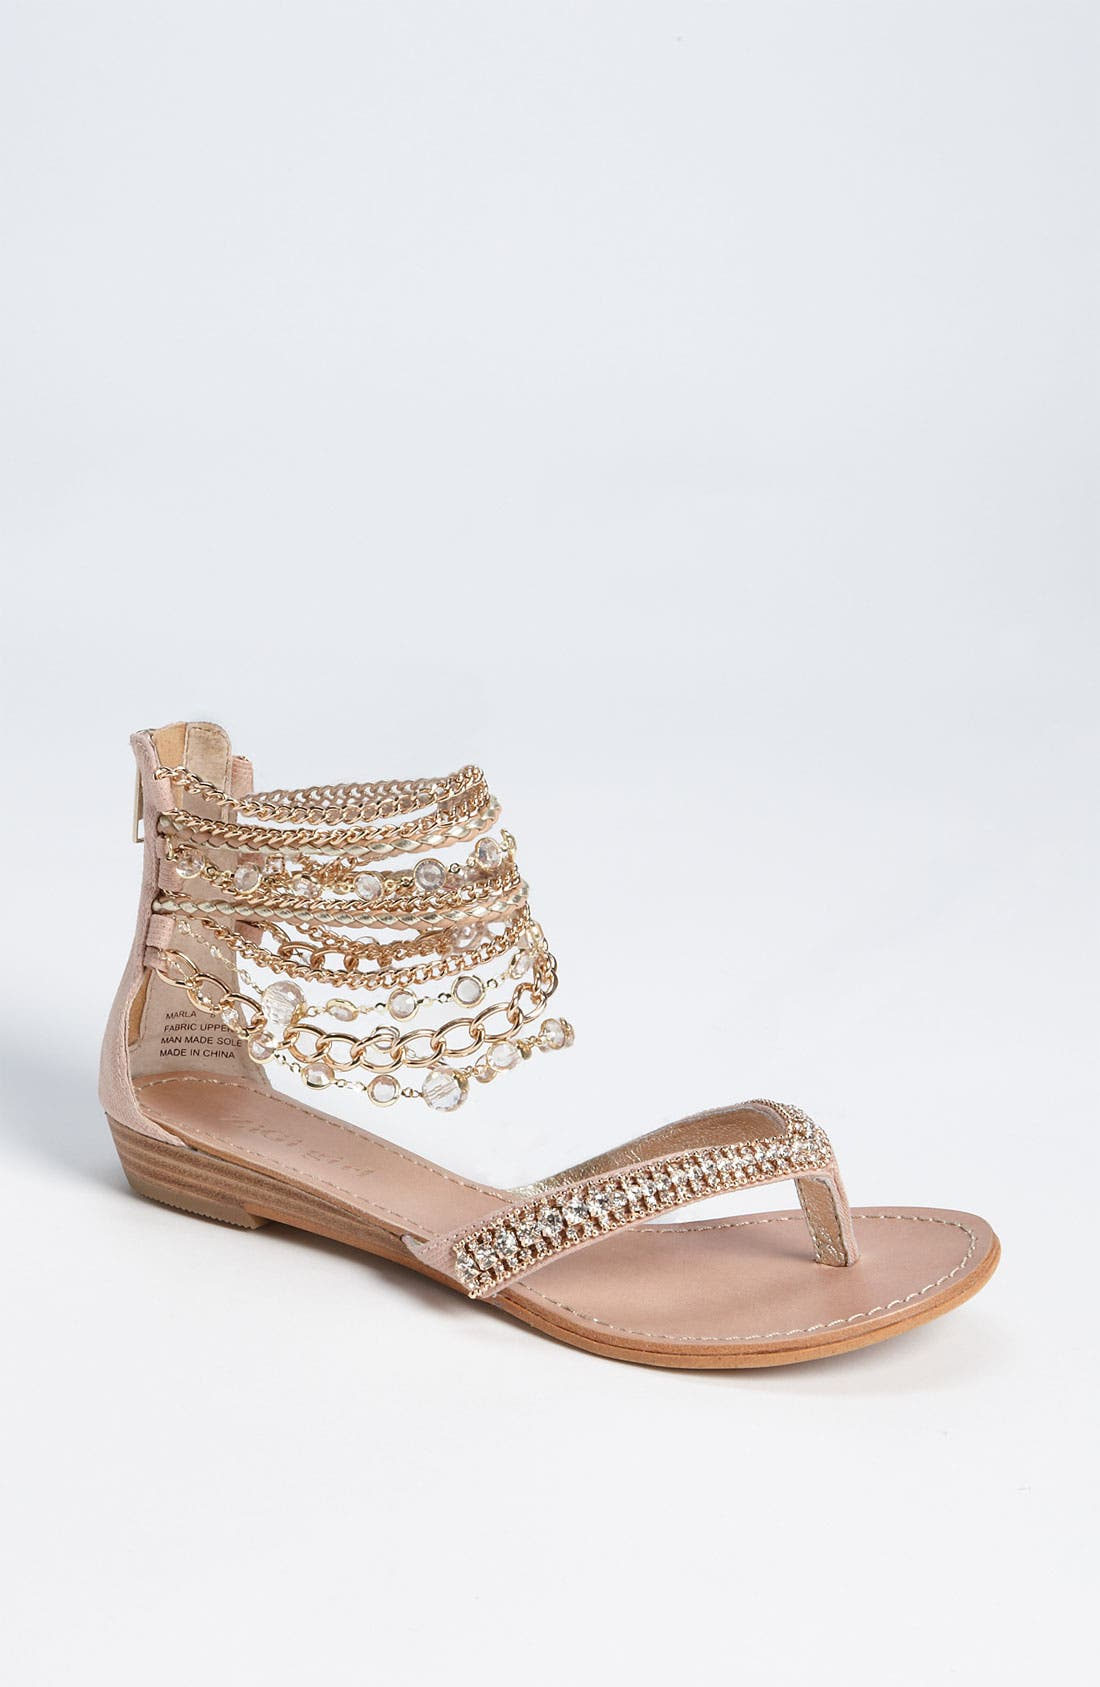 Main Image - ZiGi girl 'Marla' Sandal